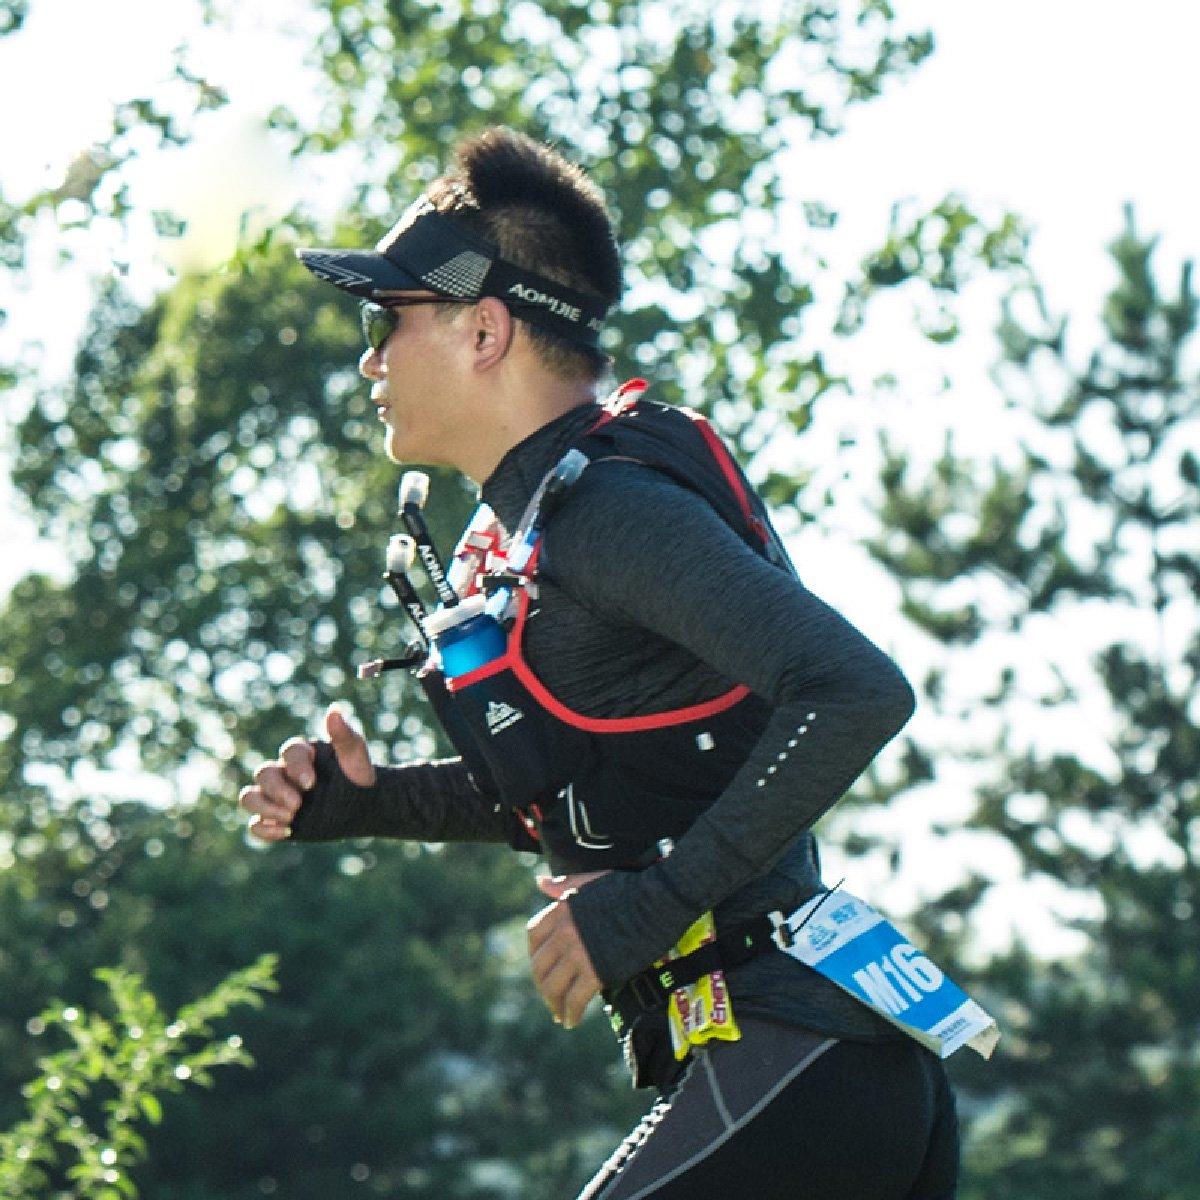 Marat/ón Ciclismo Gris TRIWONDER Runners Race Number Belt con 6 Loops para Triatl/ón Correr